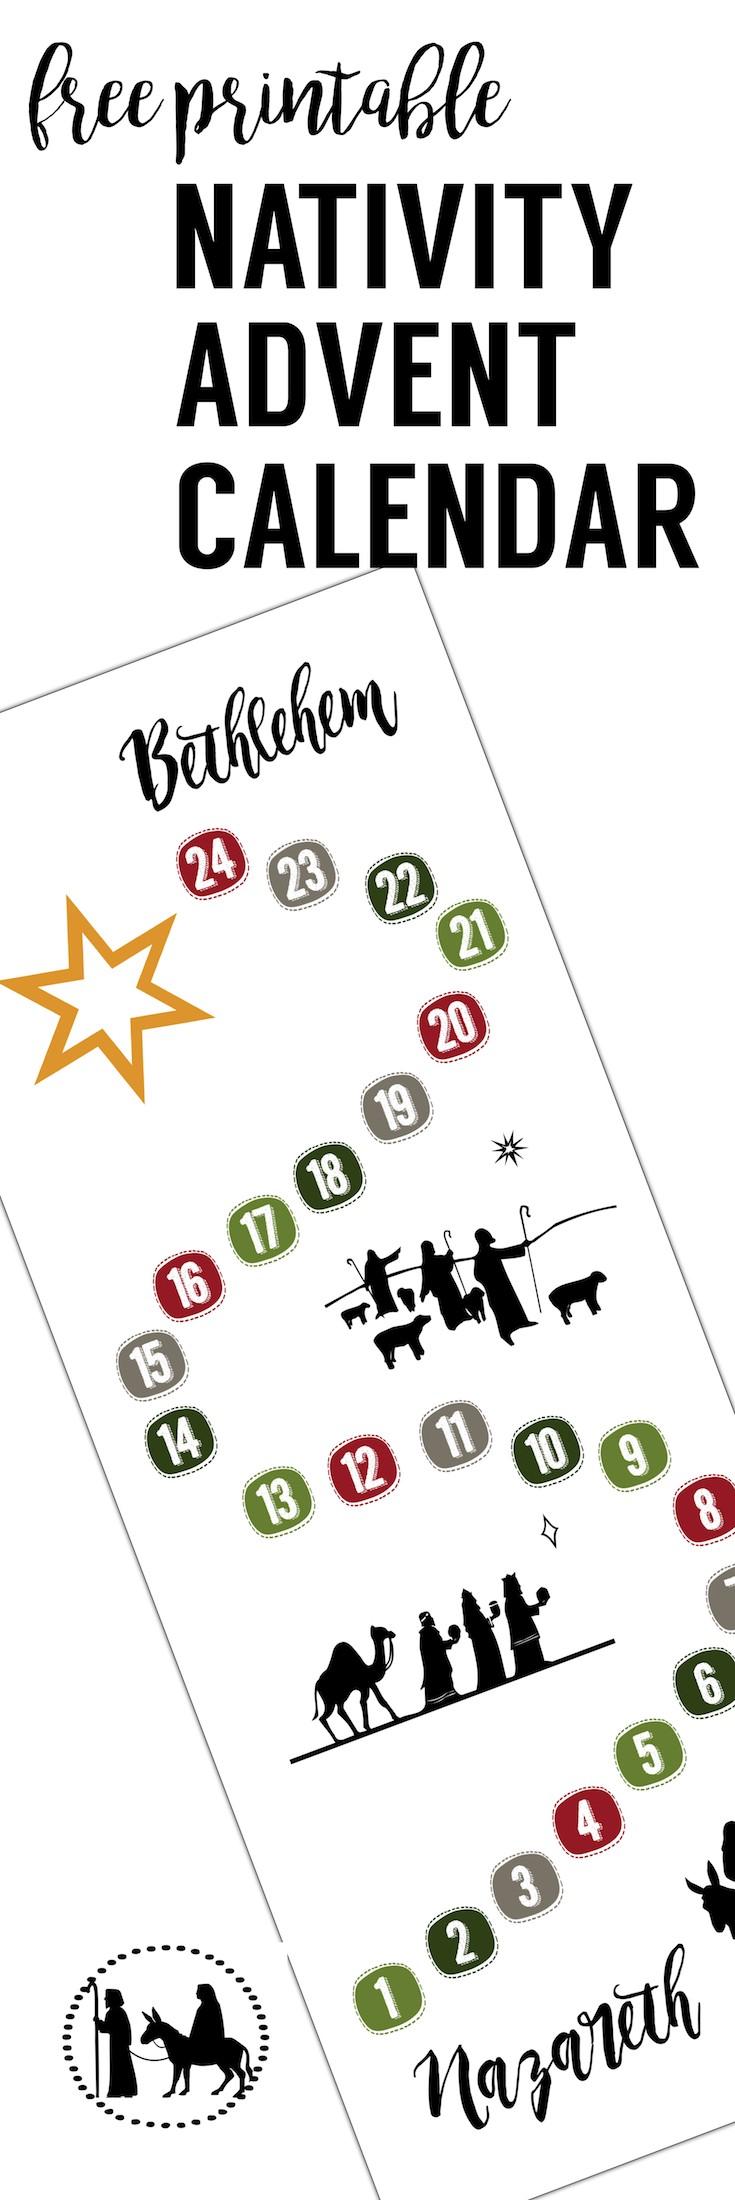 Free Printable Advent Calendar Free Advent Calendar Printable Paper Trail Design